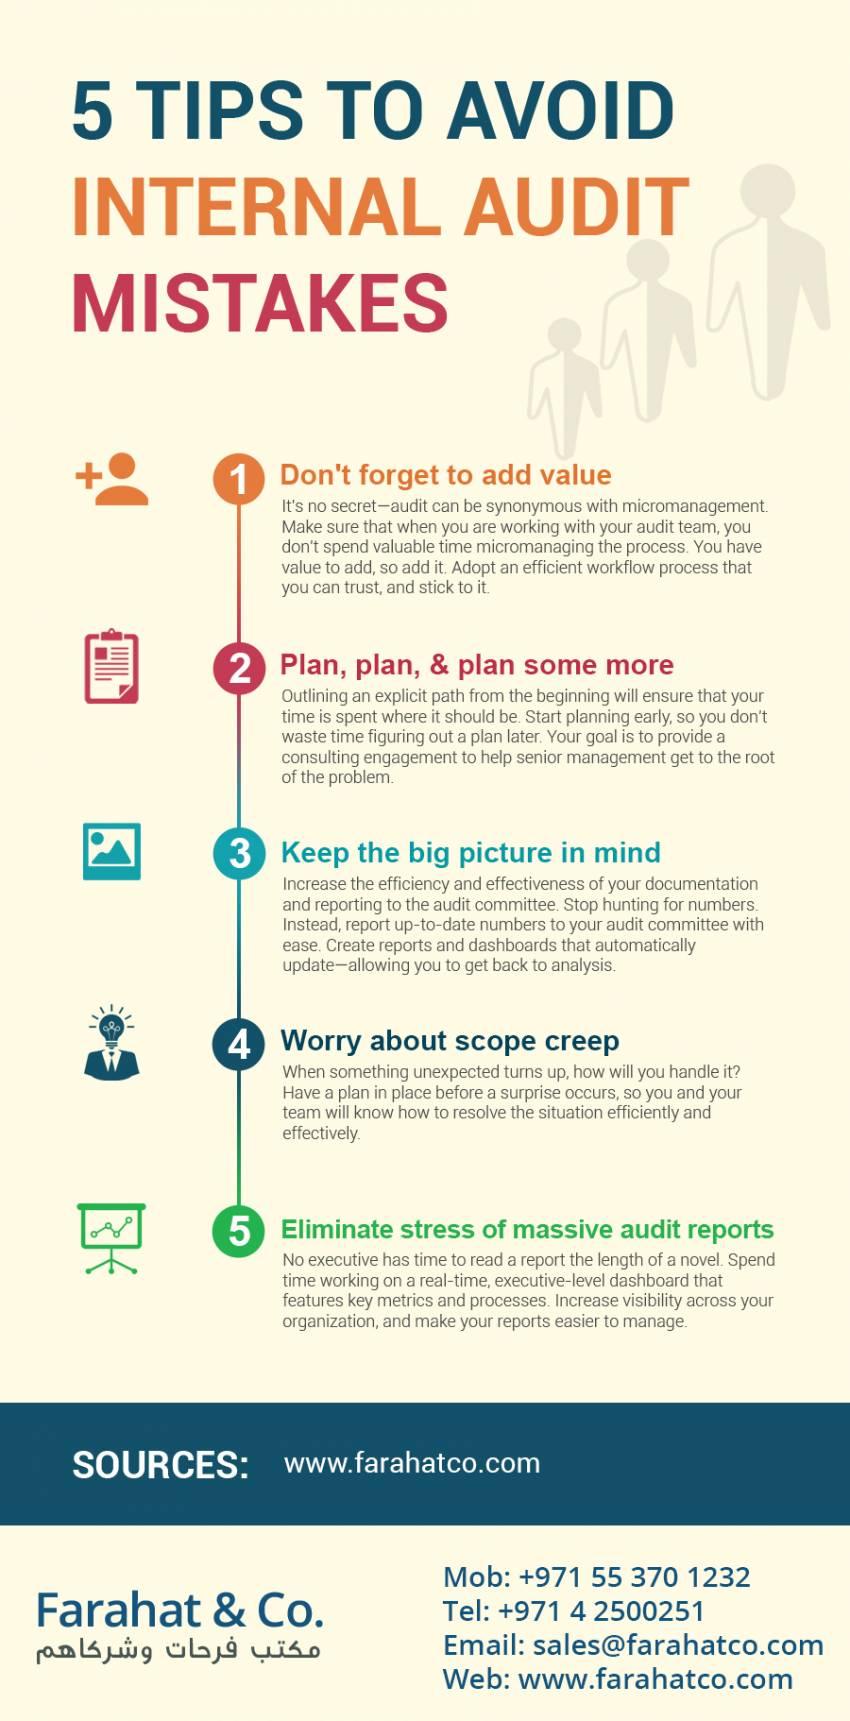 5 Tips to Avoid Internal Audit Mistakes